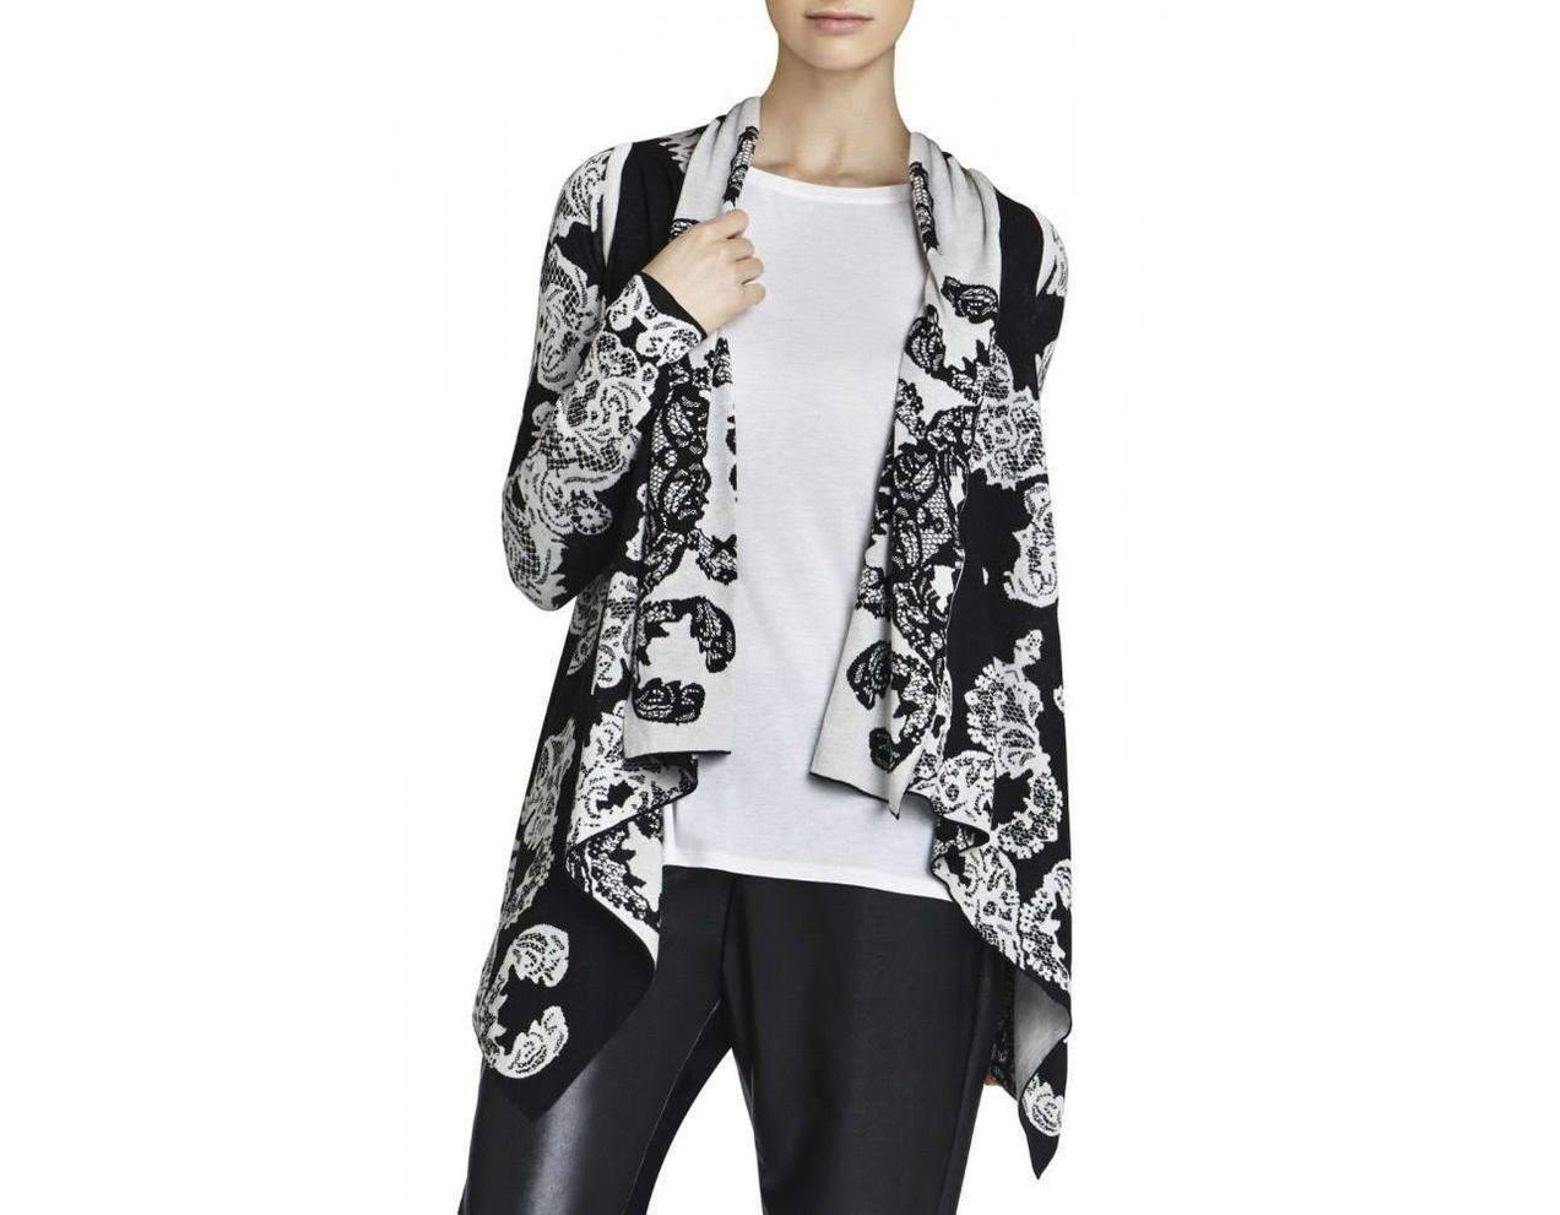 BCBG Max Azria Womens Long Sleeve Sweater Knit Top Ginata Jacquard Cardigan